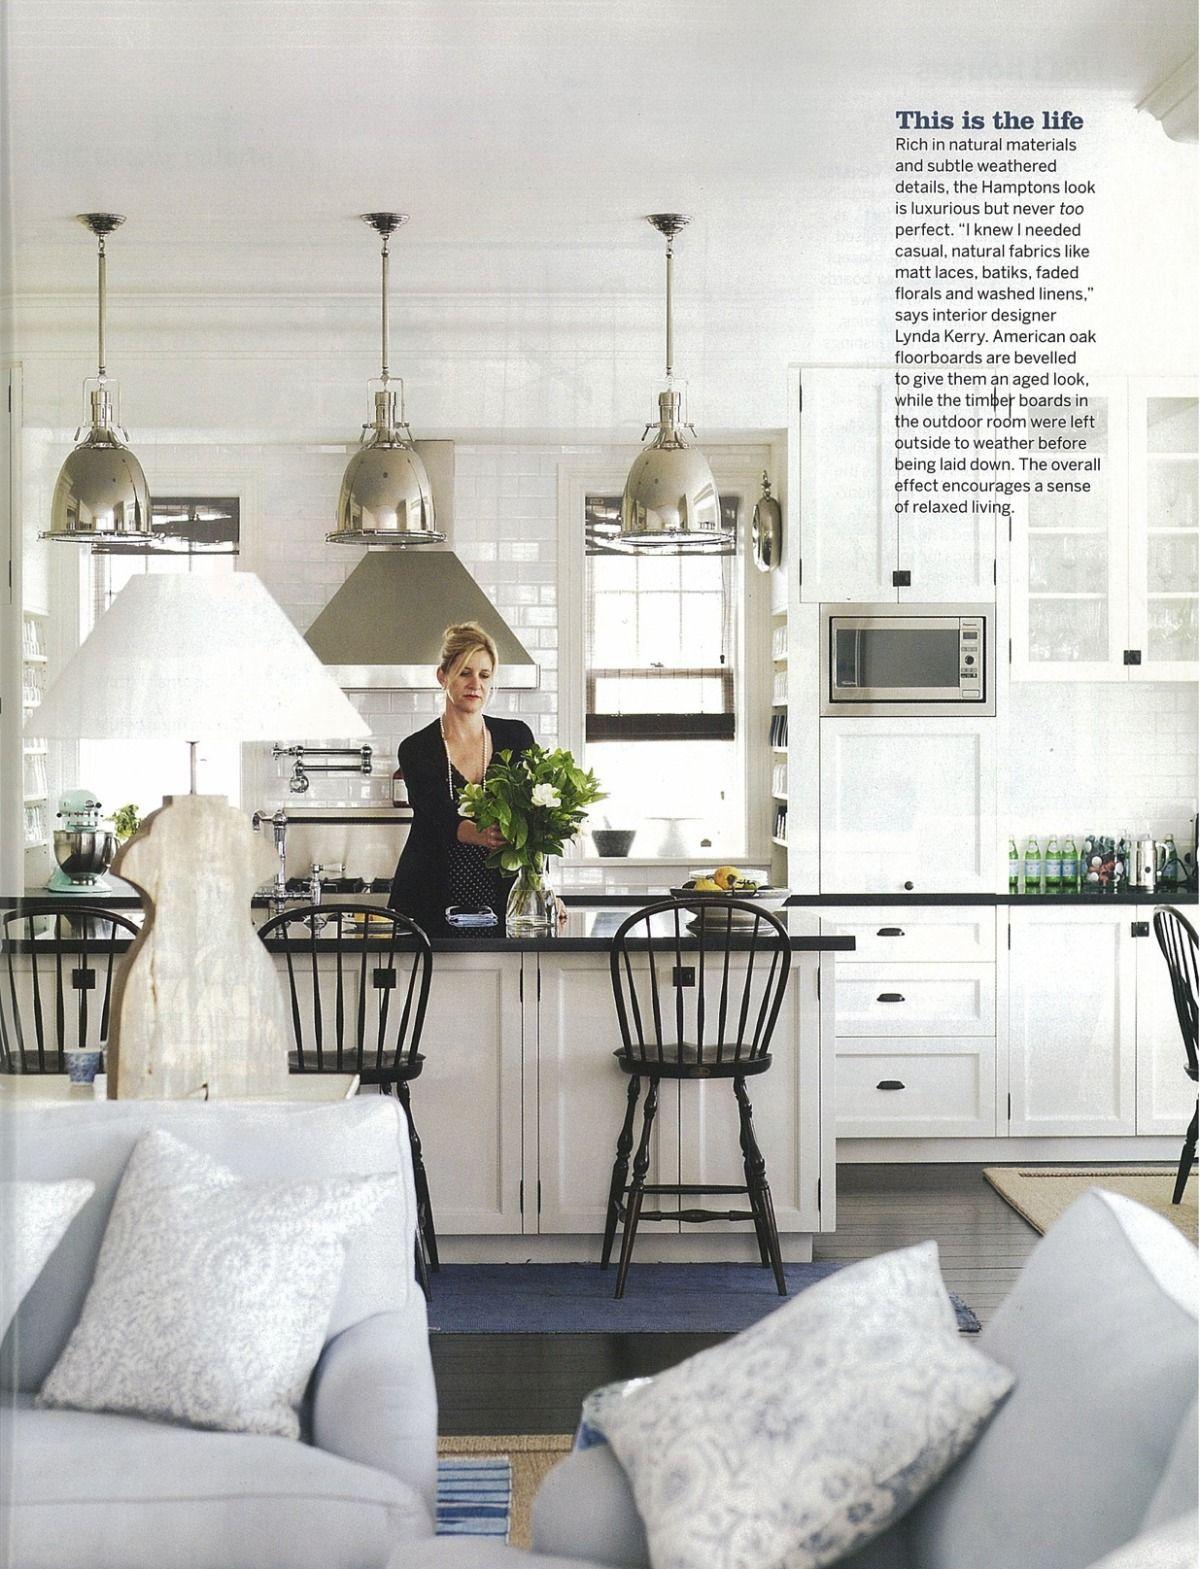 Kitchen And Living Room Interior Design: Lynda Kerry Interior Design